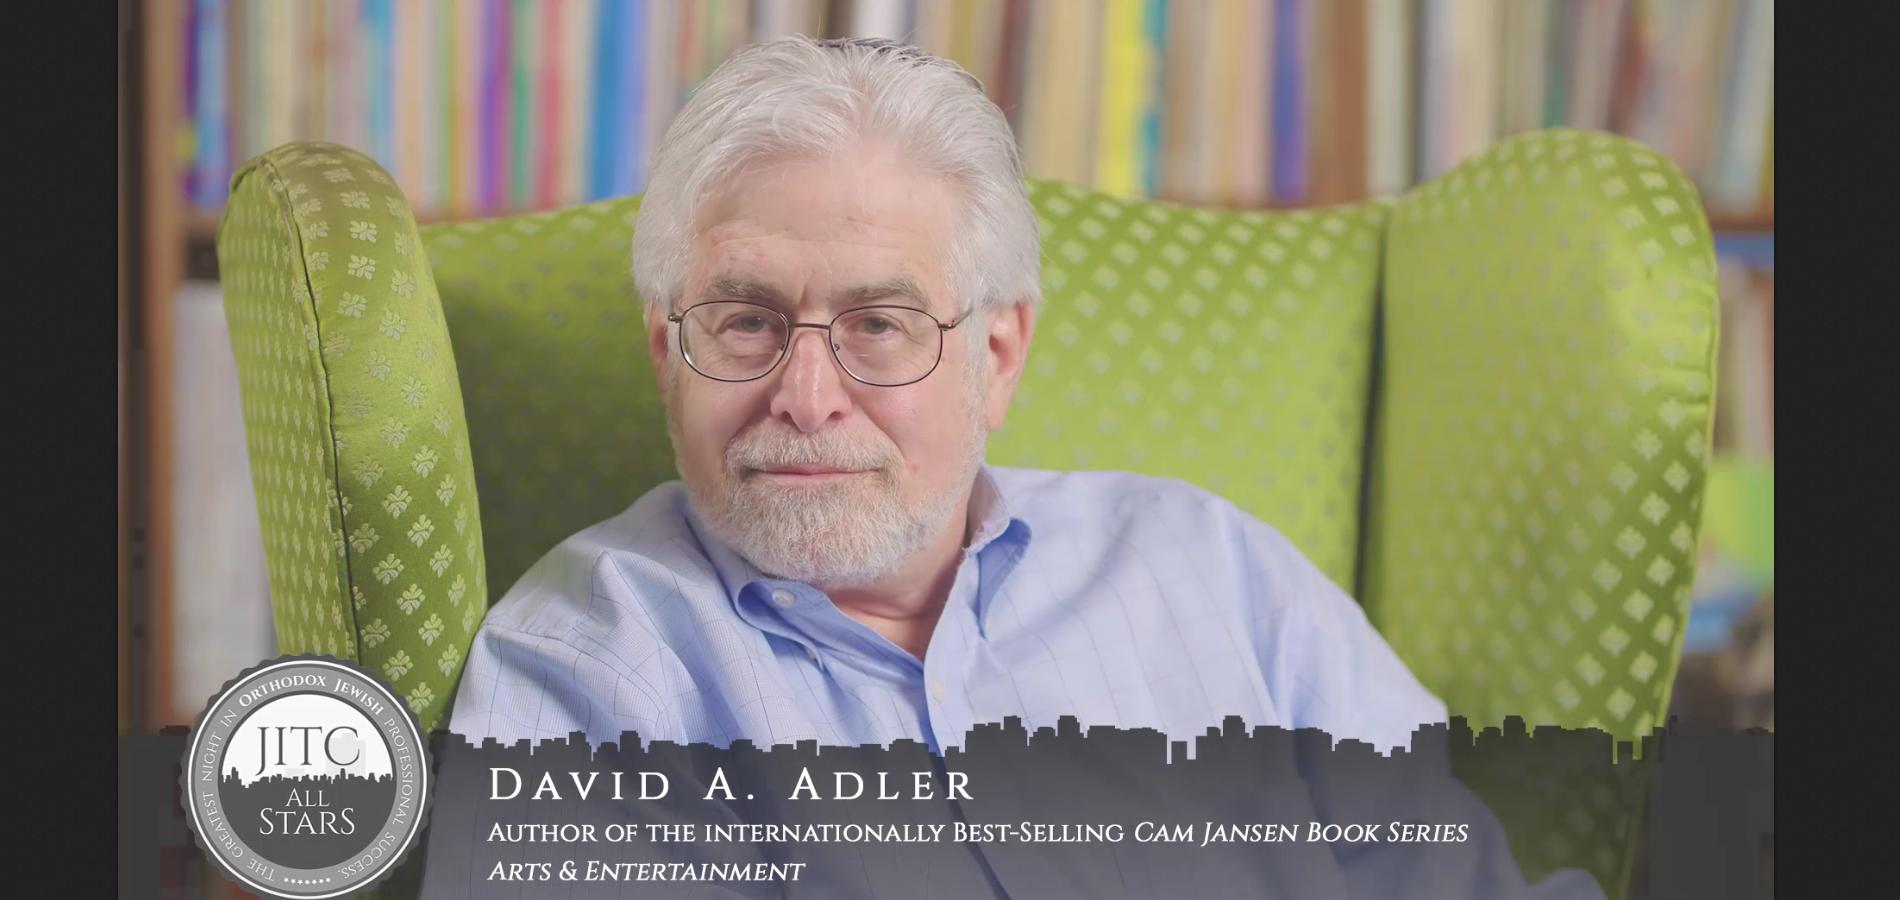 Orthodox Jewish All-Star, David A. Adler, Cam Jansen Author